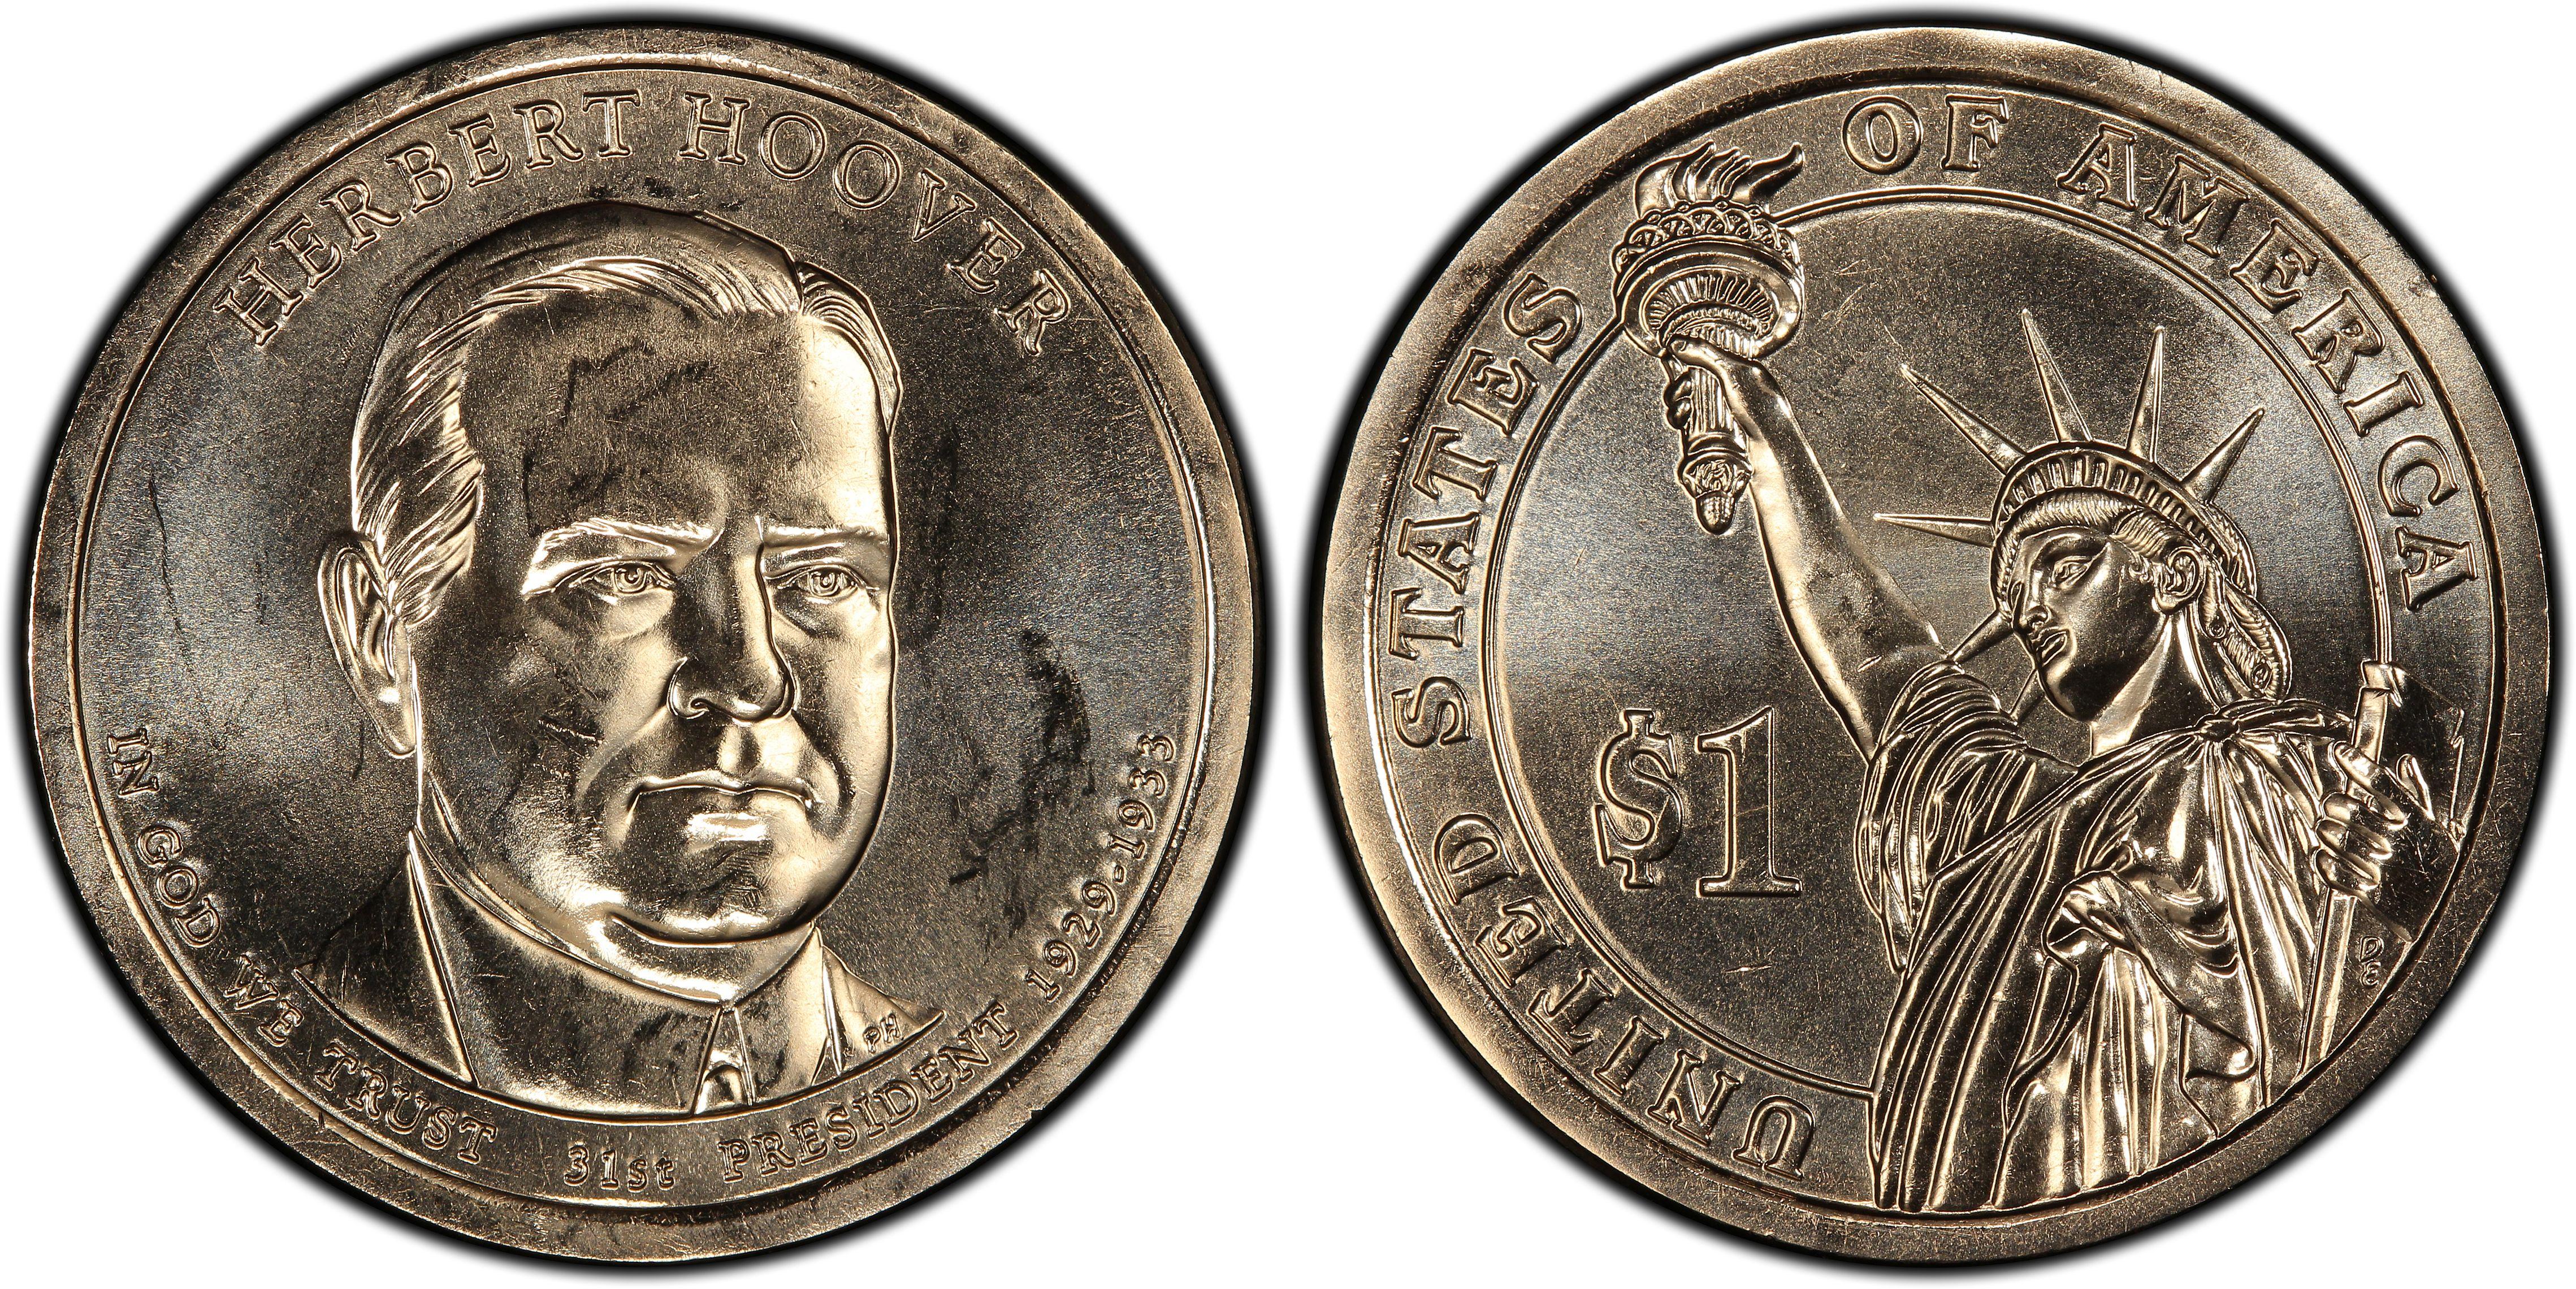 PCGS MS67 2014-D Herbert Hoover Presidential Dollar Position A